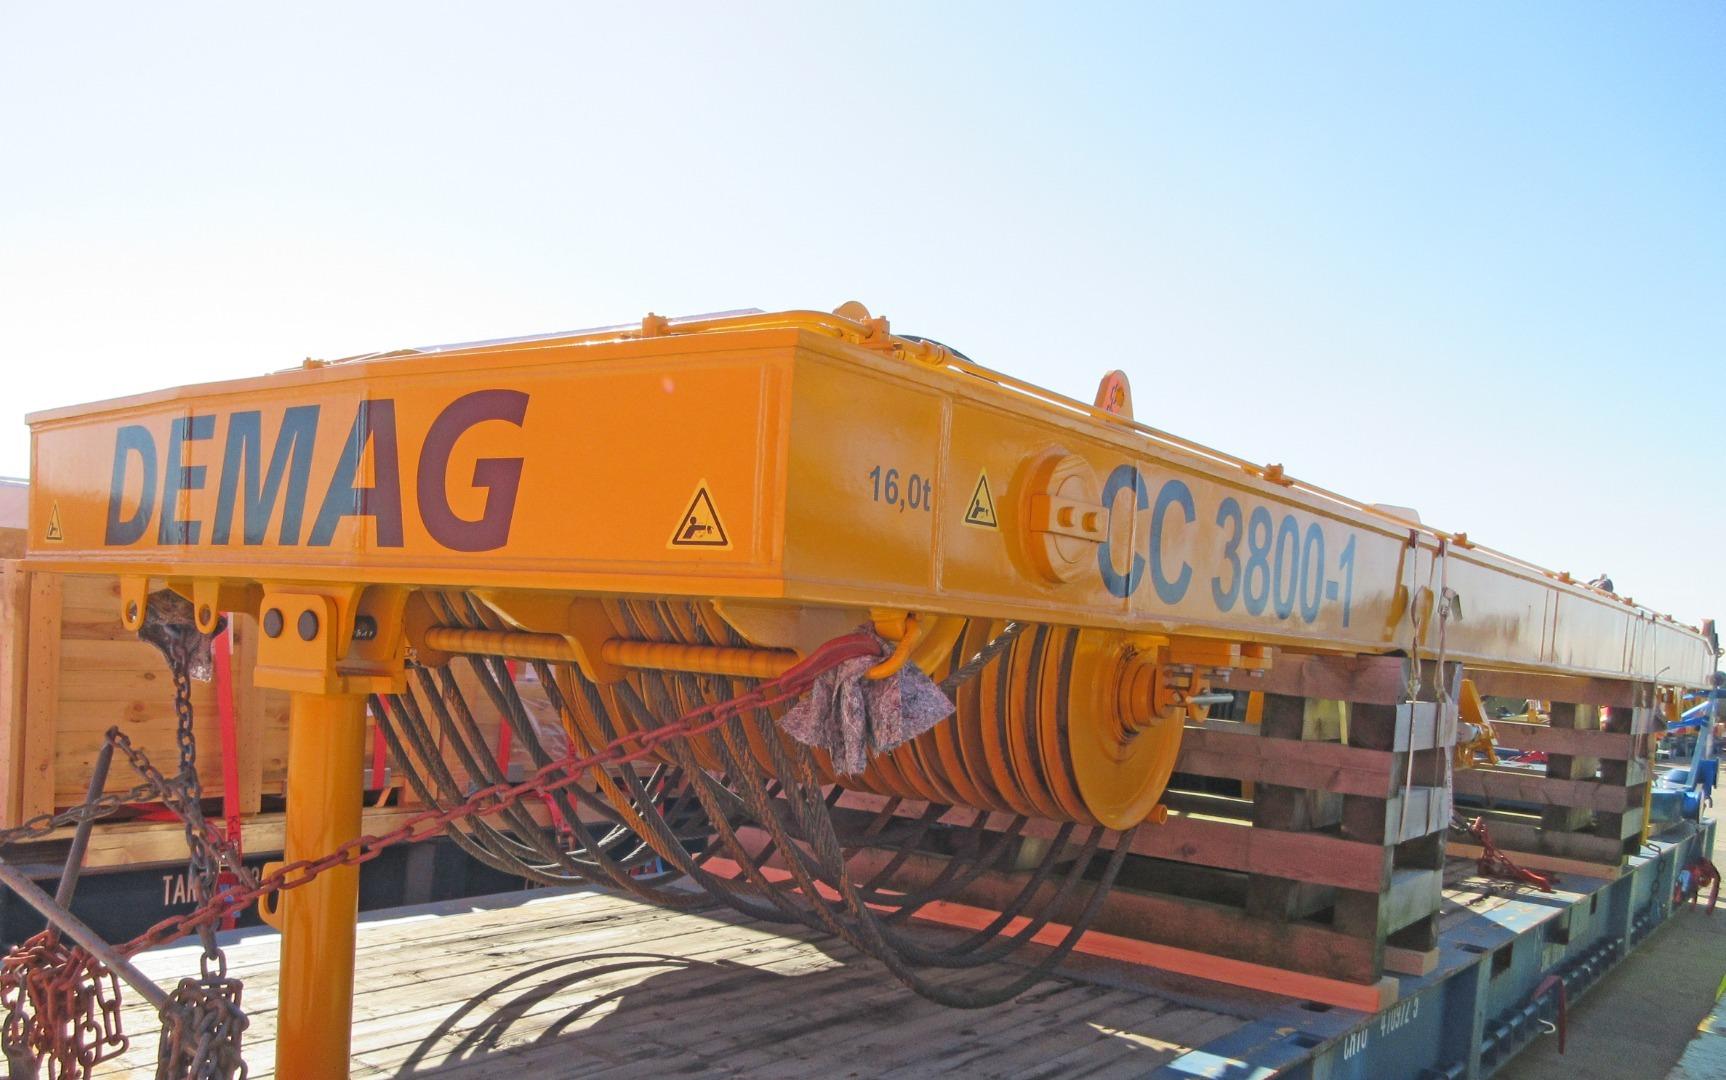 Demag CC 3800-1